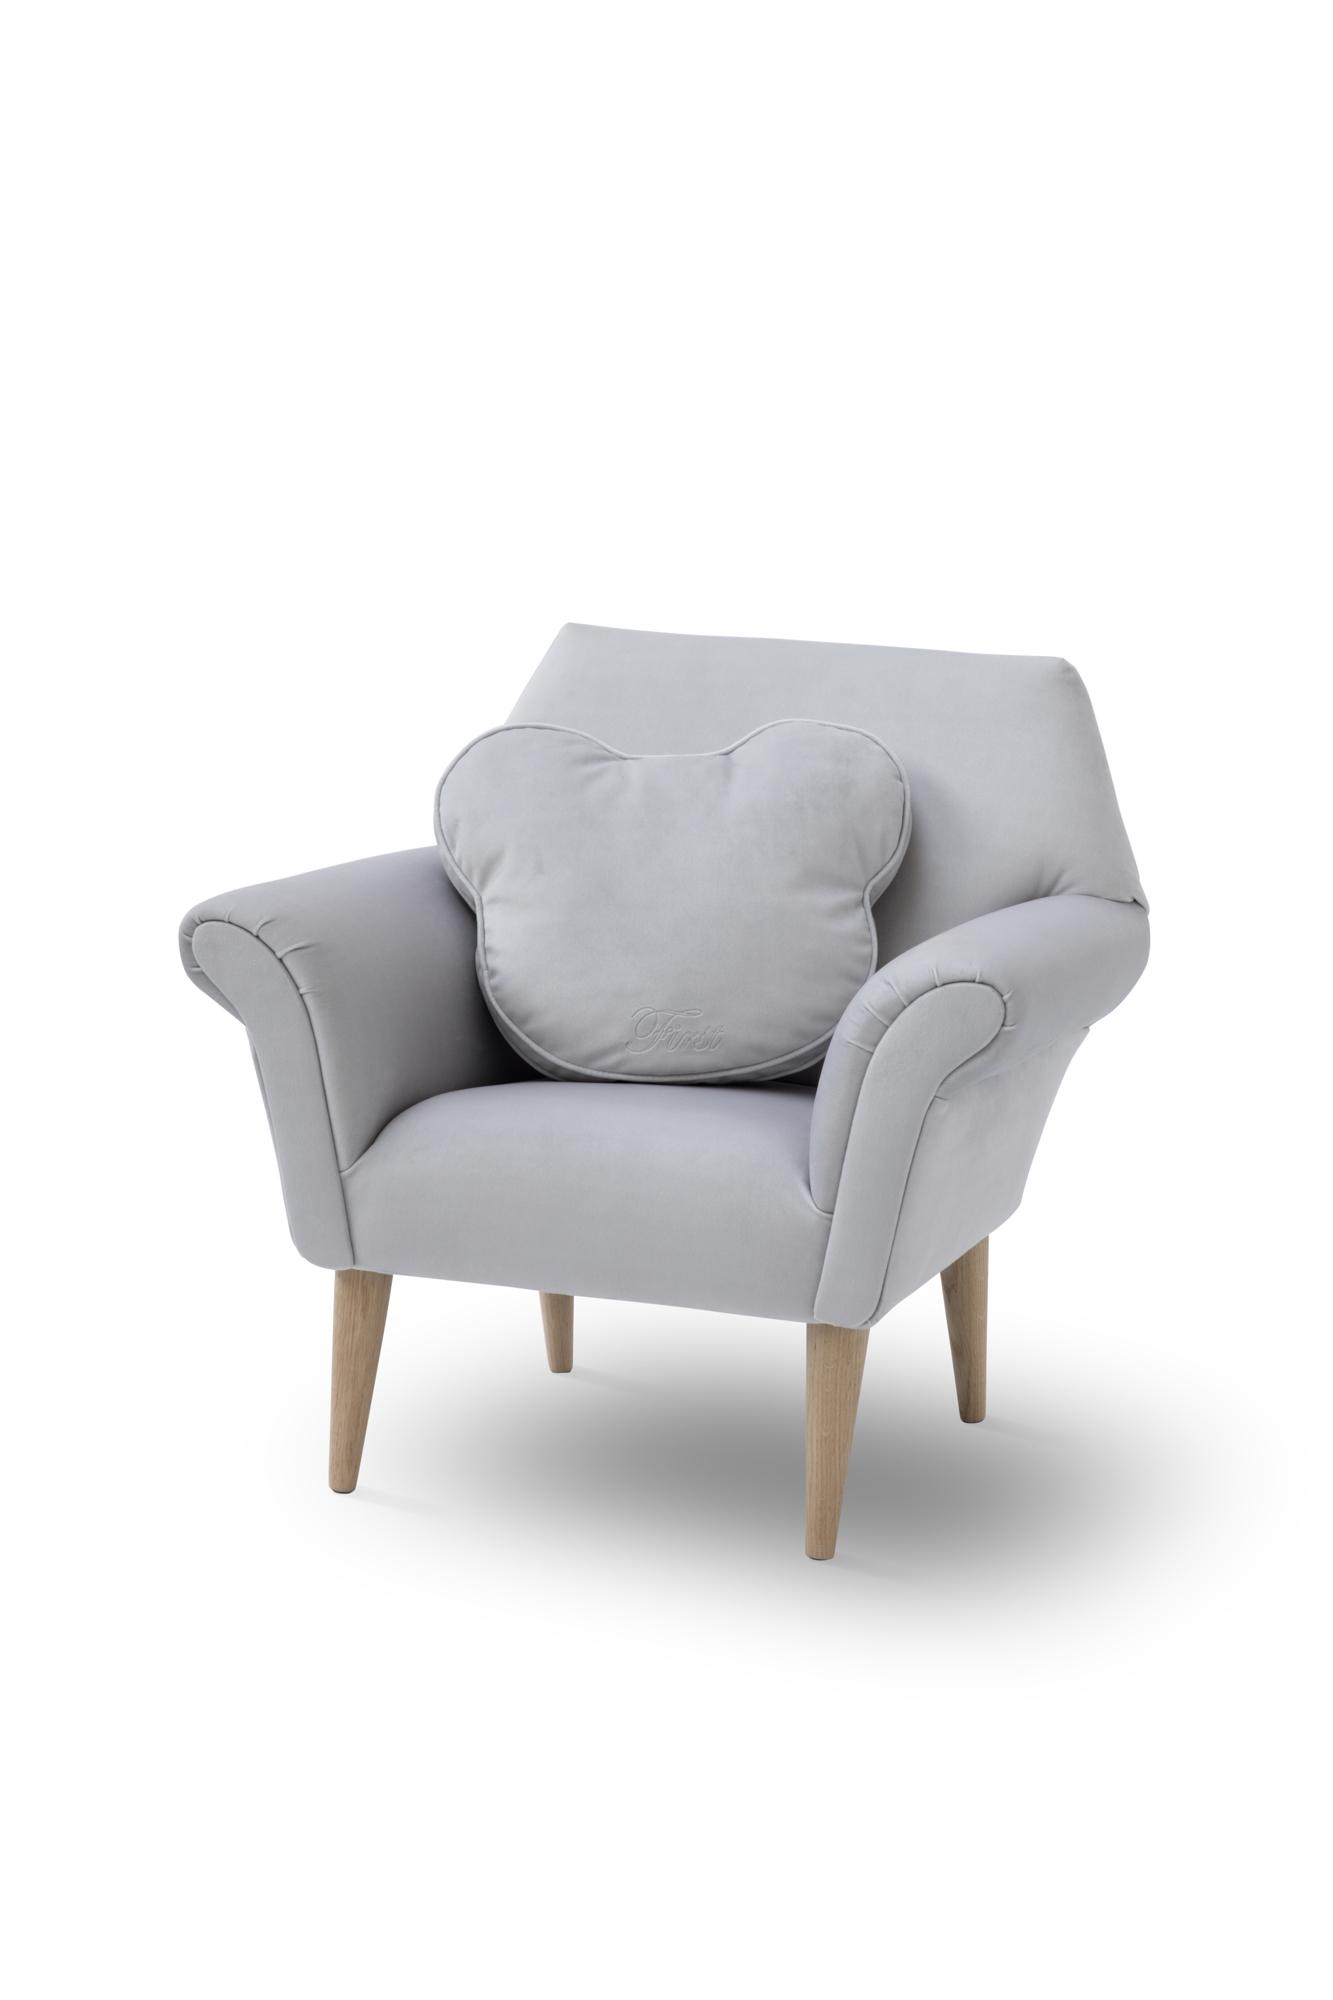 City mini sofa